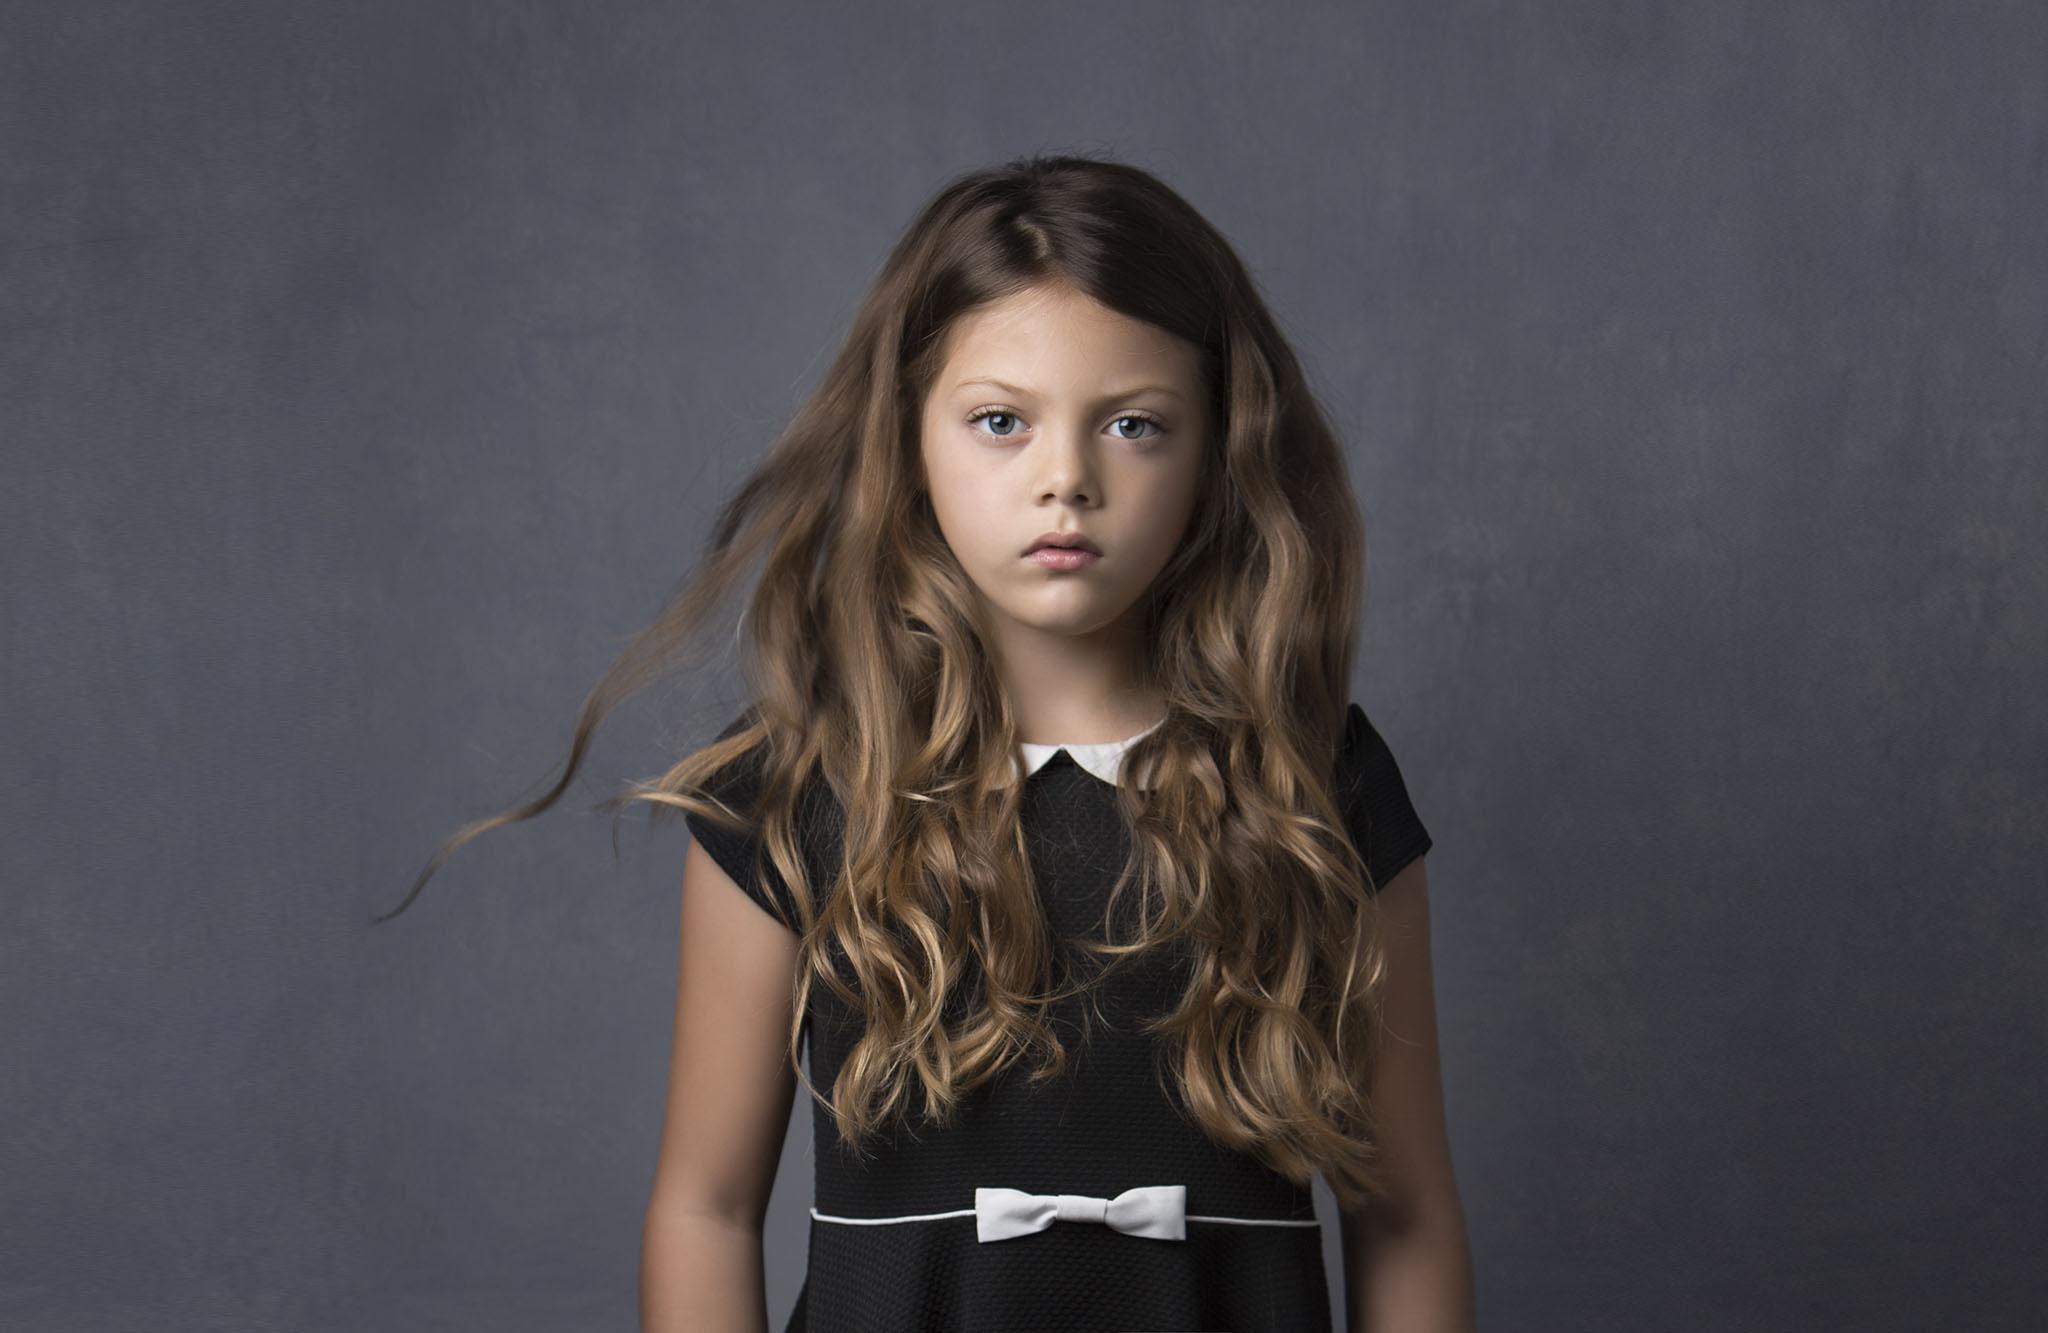 elizabethgphotography_kingslangley_hertfordshire_fineart_childrens_photography_33.jpg